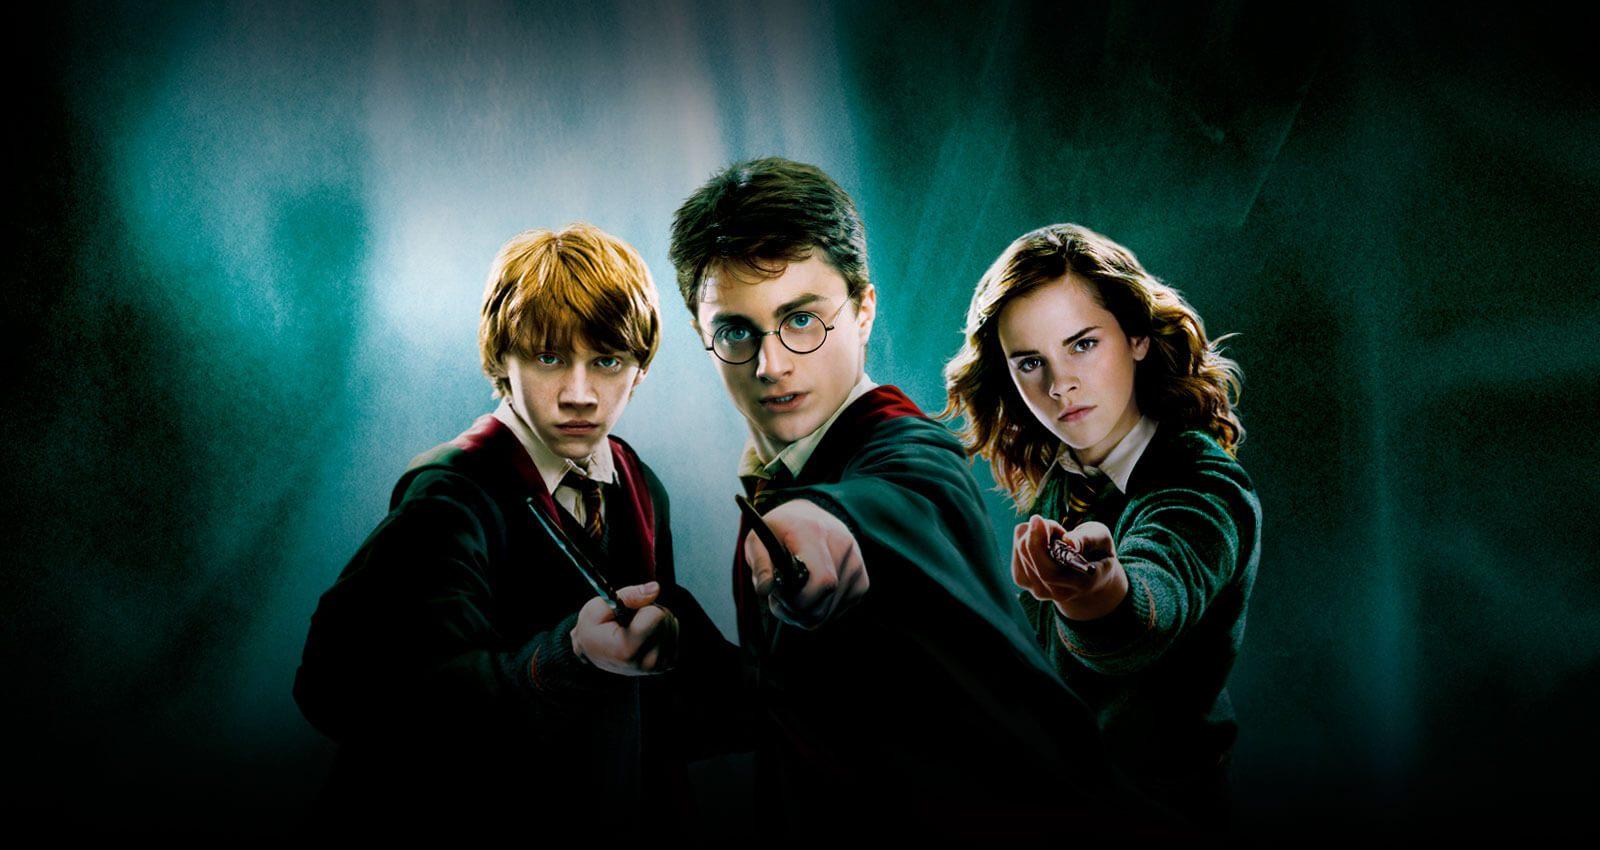 Harry Potter RPG si chiamerà Hogwarts: A Dark Legacy? Trapelano nuovi dettagli da un leak